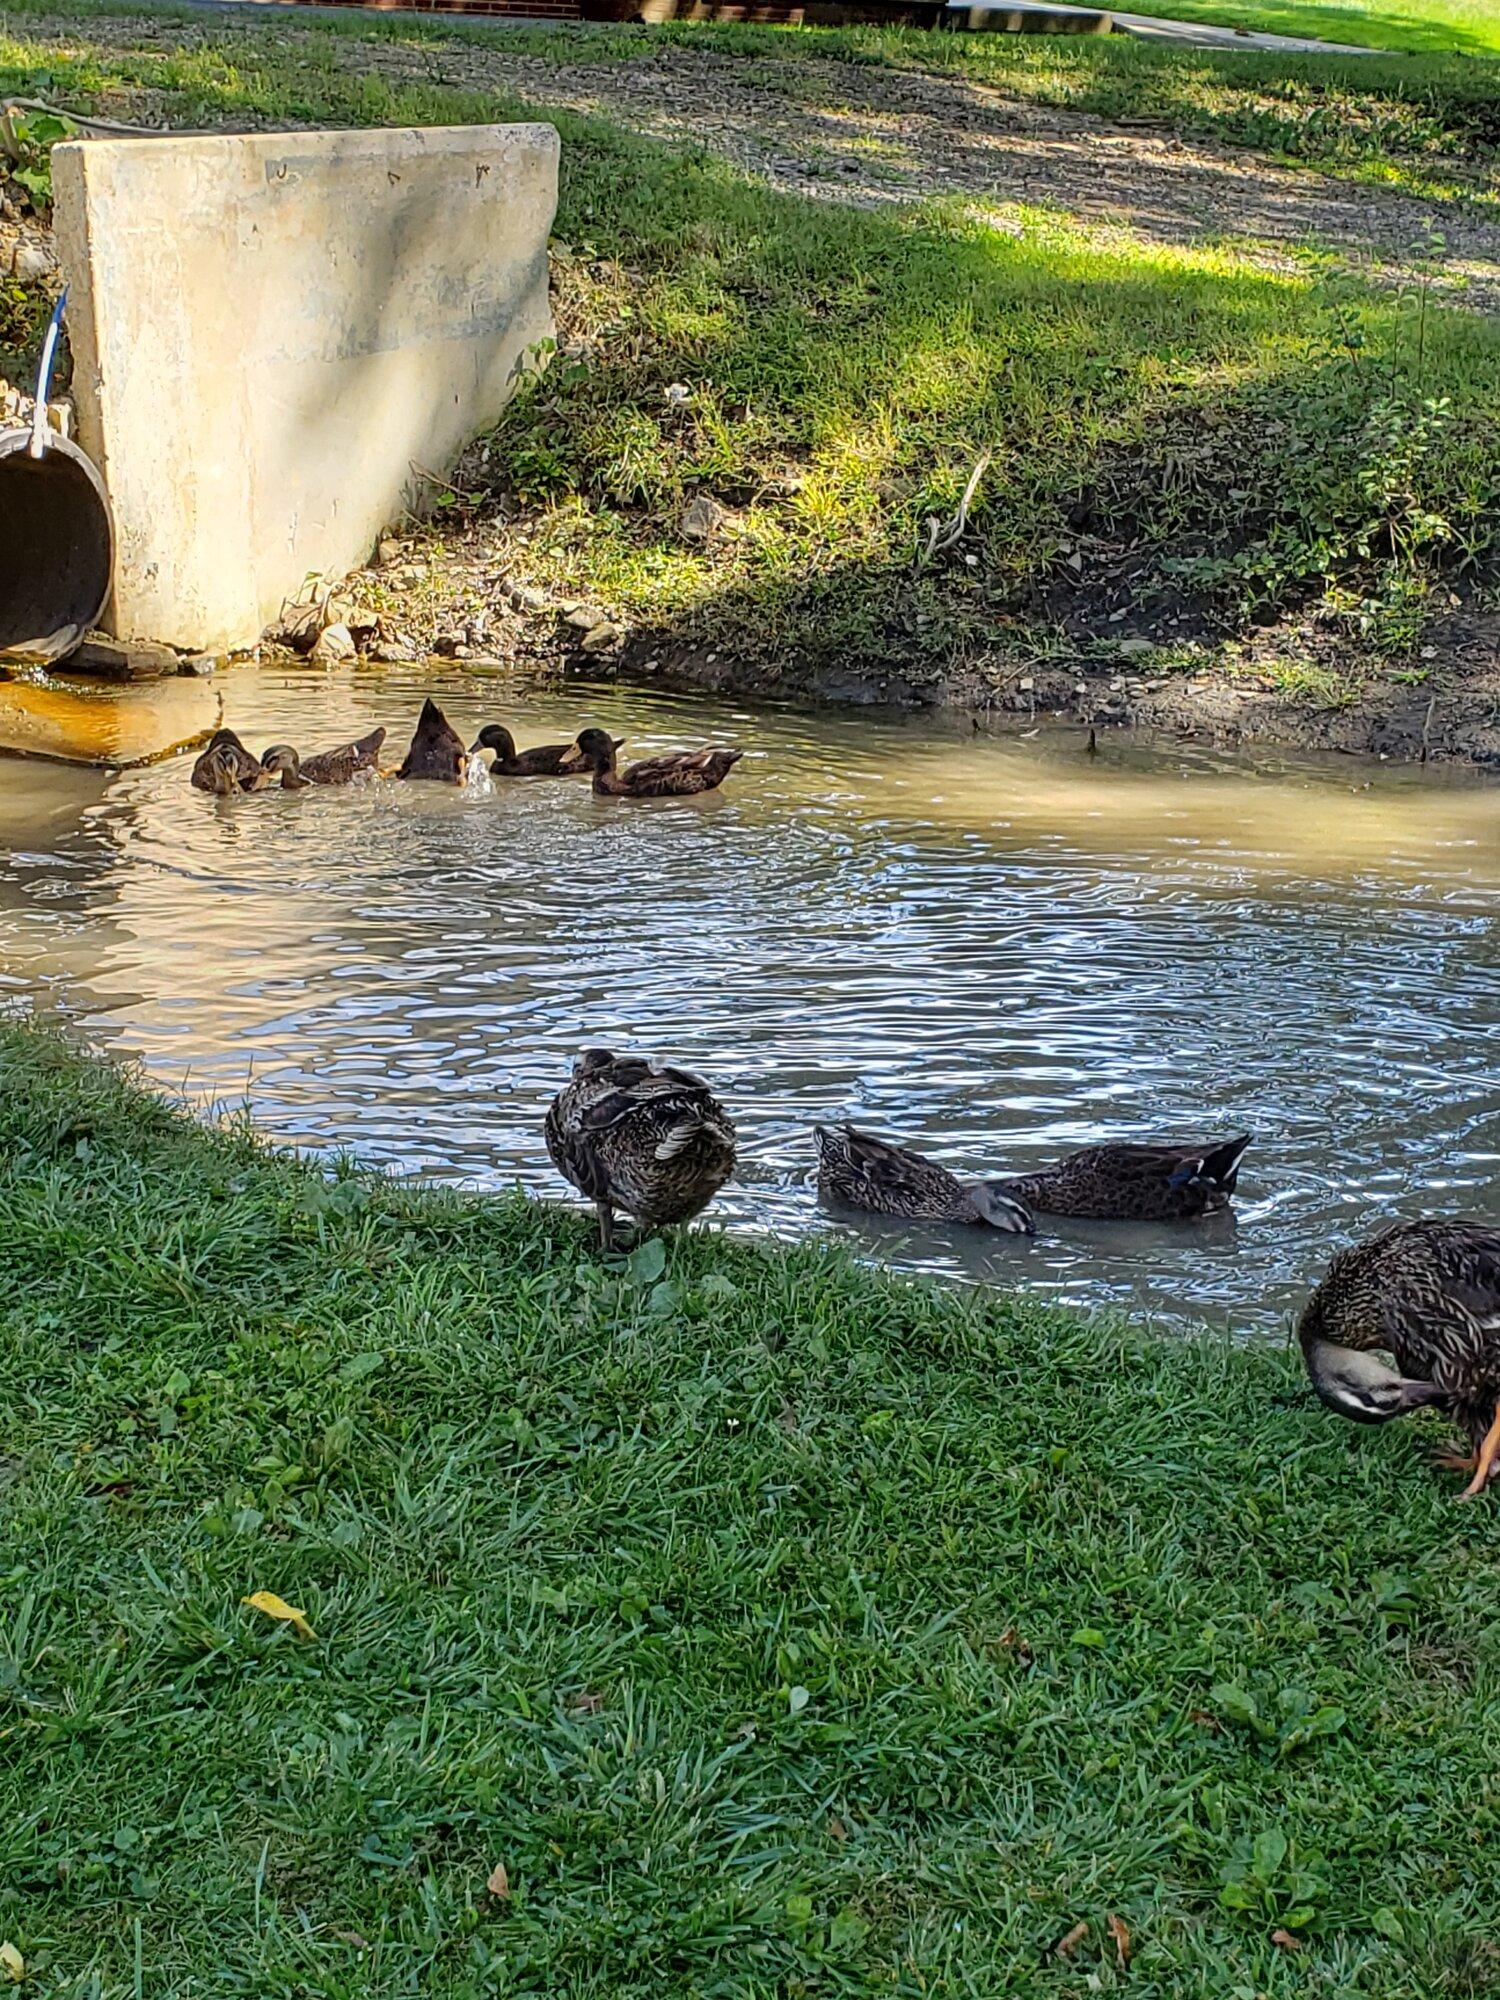 ducks together.jpg